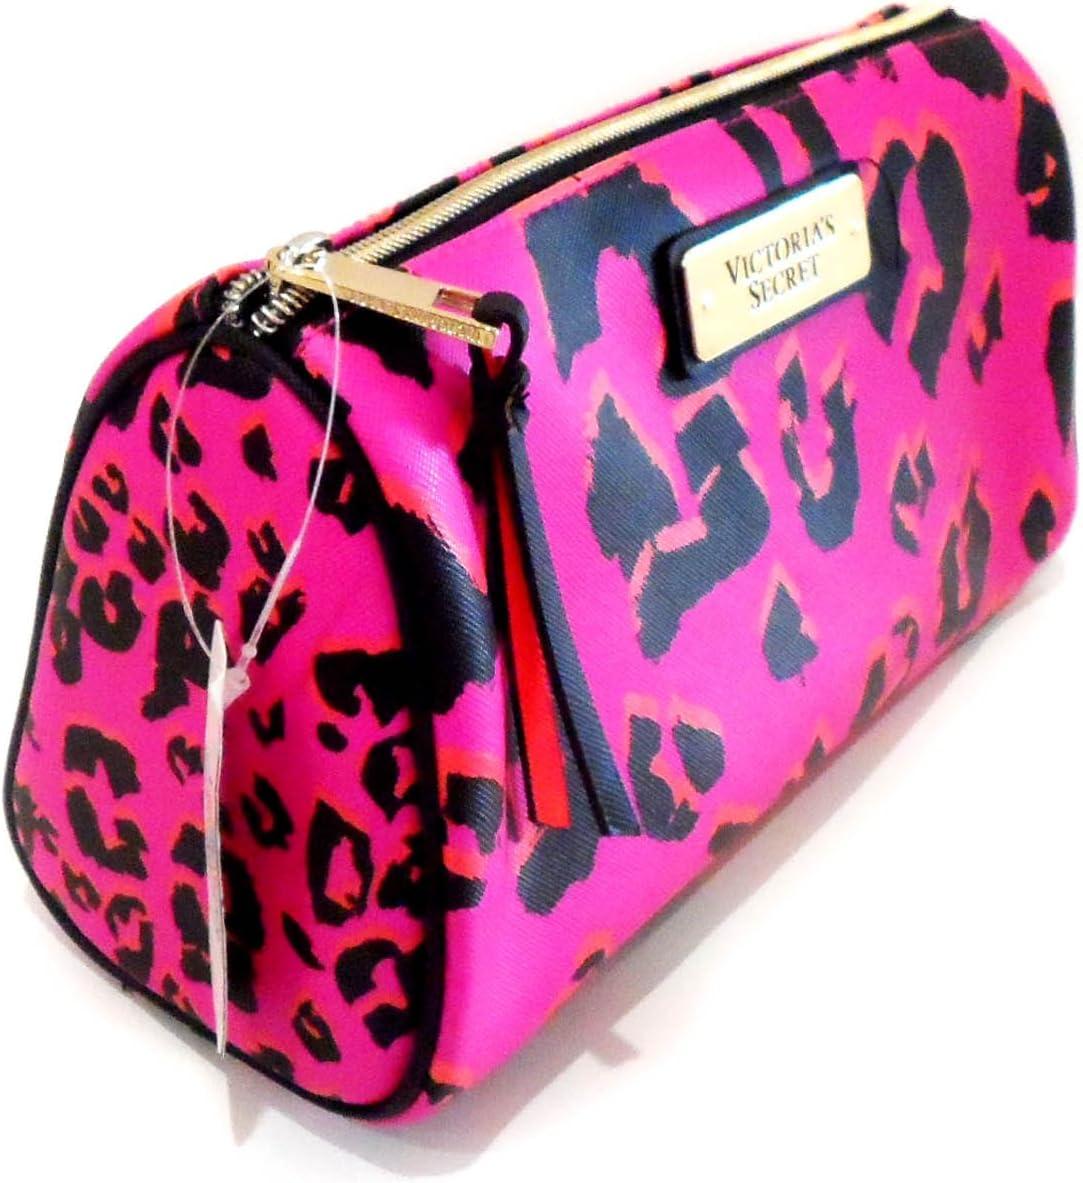 New Genuine Victoria s Secret rosa Leopardo Logo bolsa de maquillaje estuche de maquillaje, (): Amazon.es: Belleza